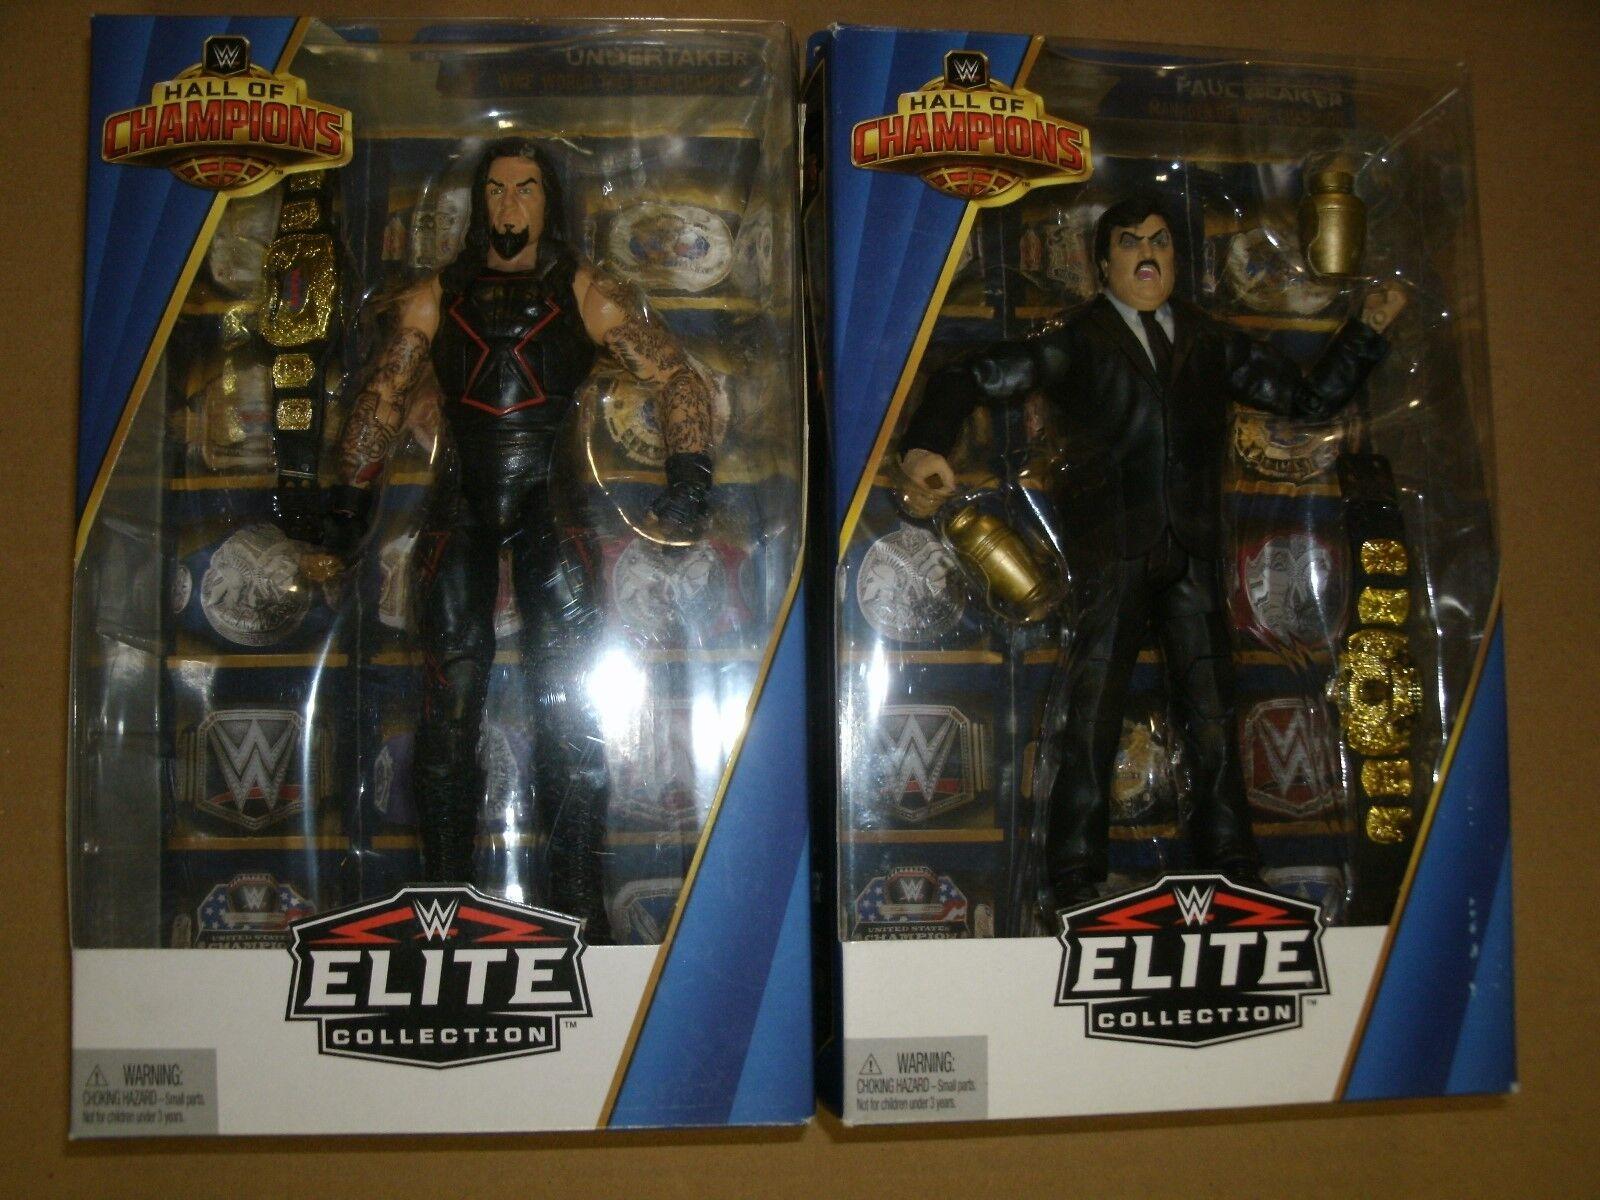 WWE PAUL BEARER & UNDERTAKER ELITE HALL OF CHAMPIONS CHAMPIONS CHAMPIONS FIGURE 1f1ca4